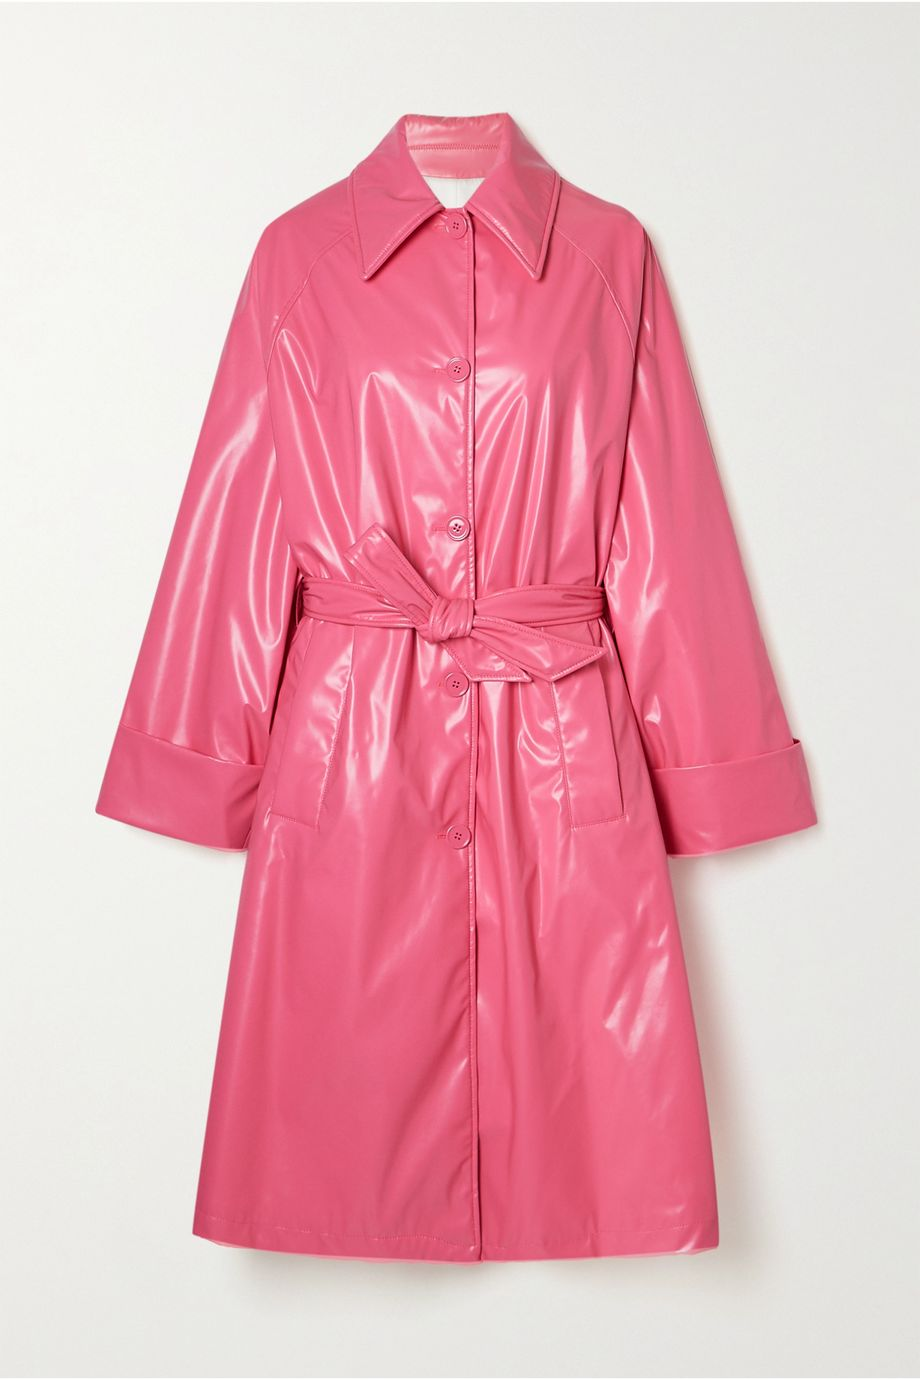 MM6 Maison Margiela Belted vinyl coat